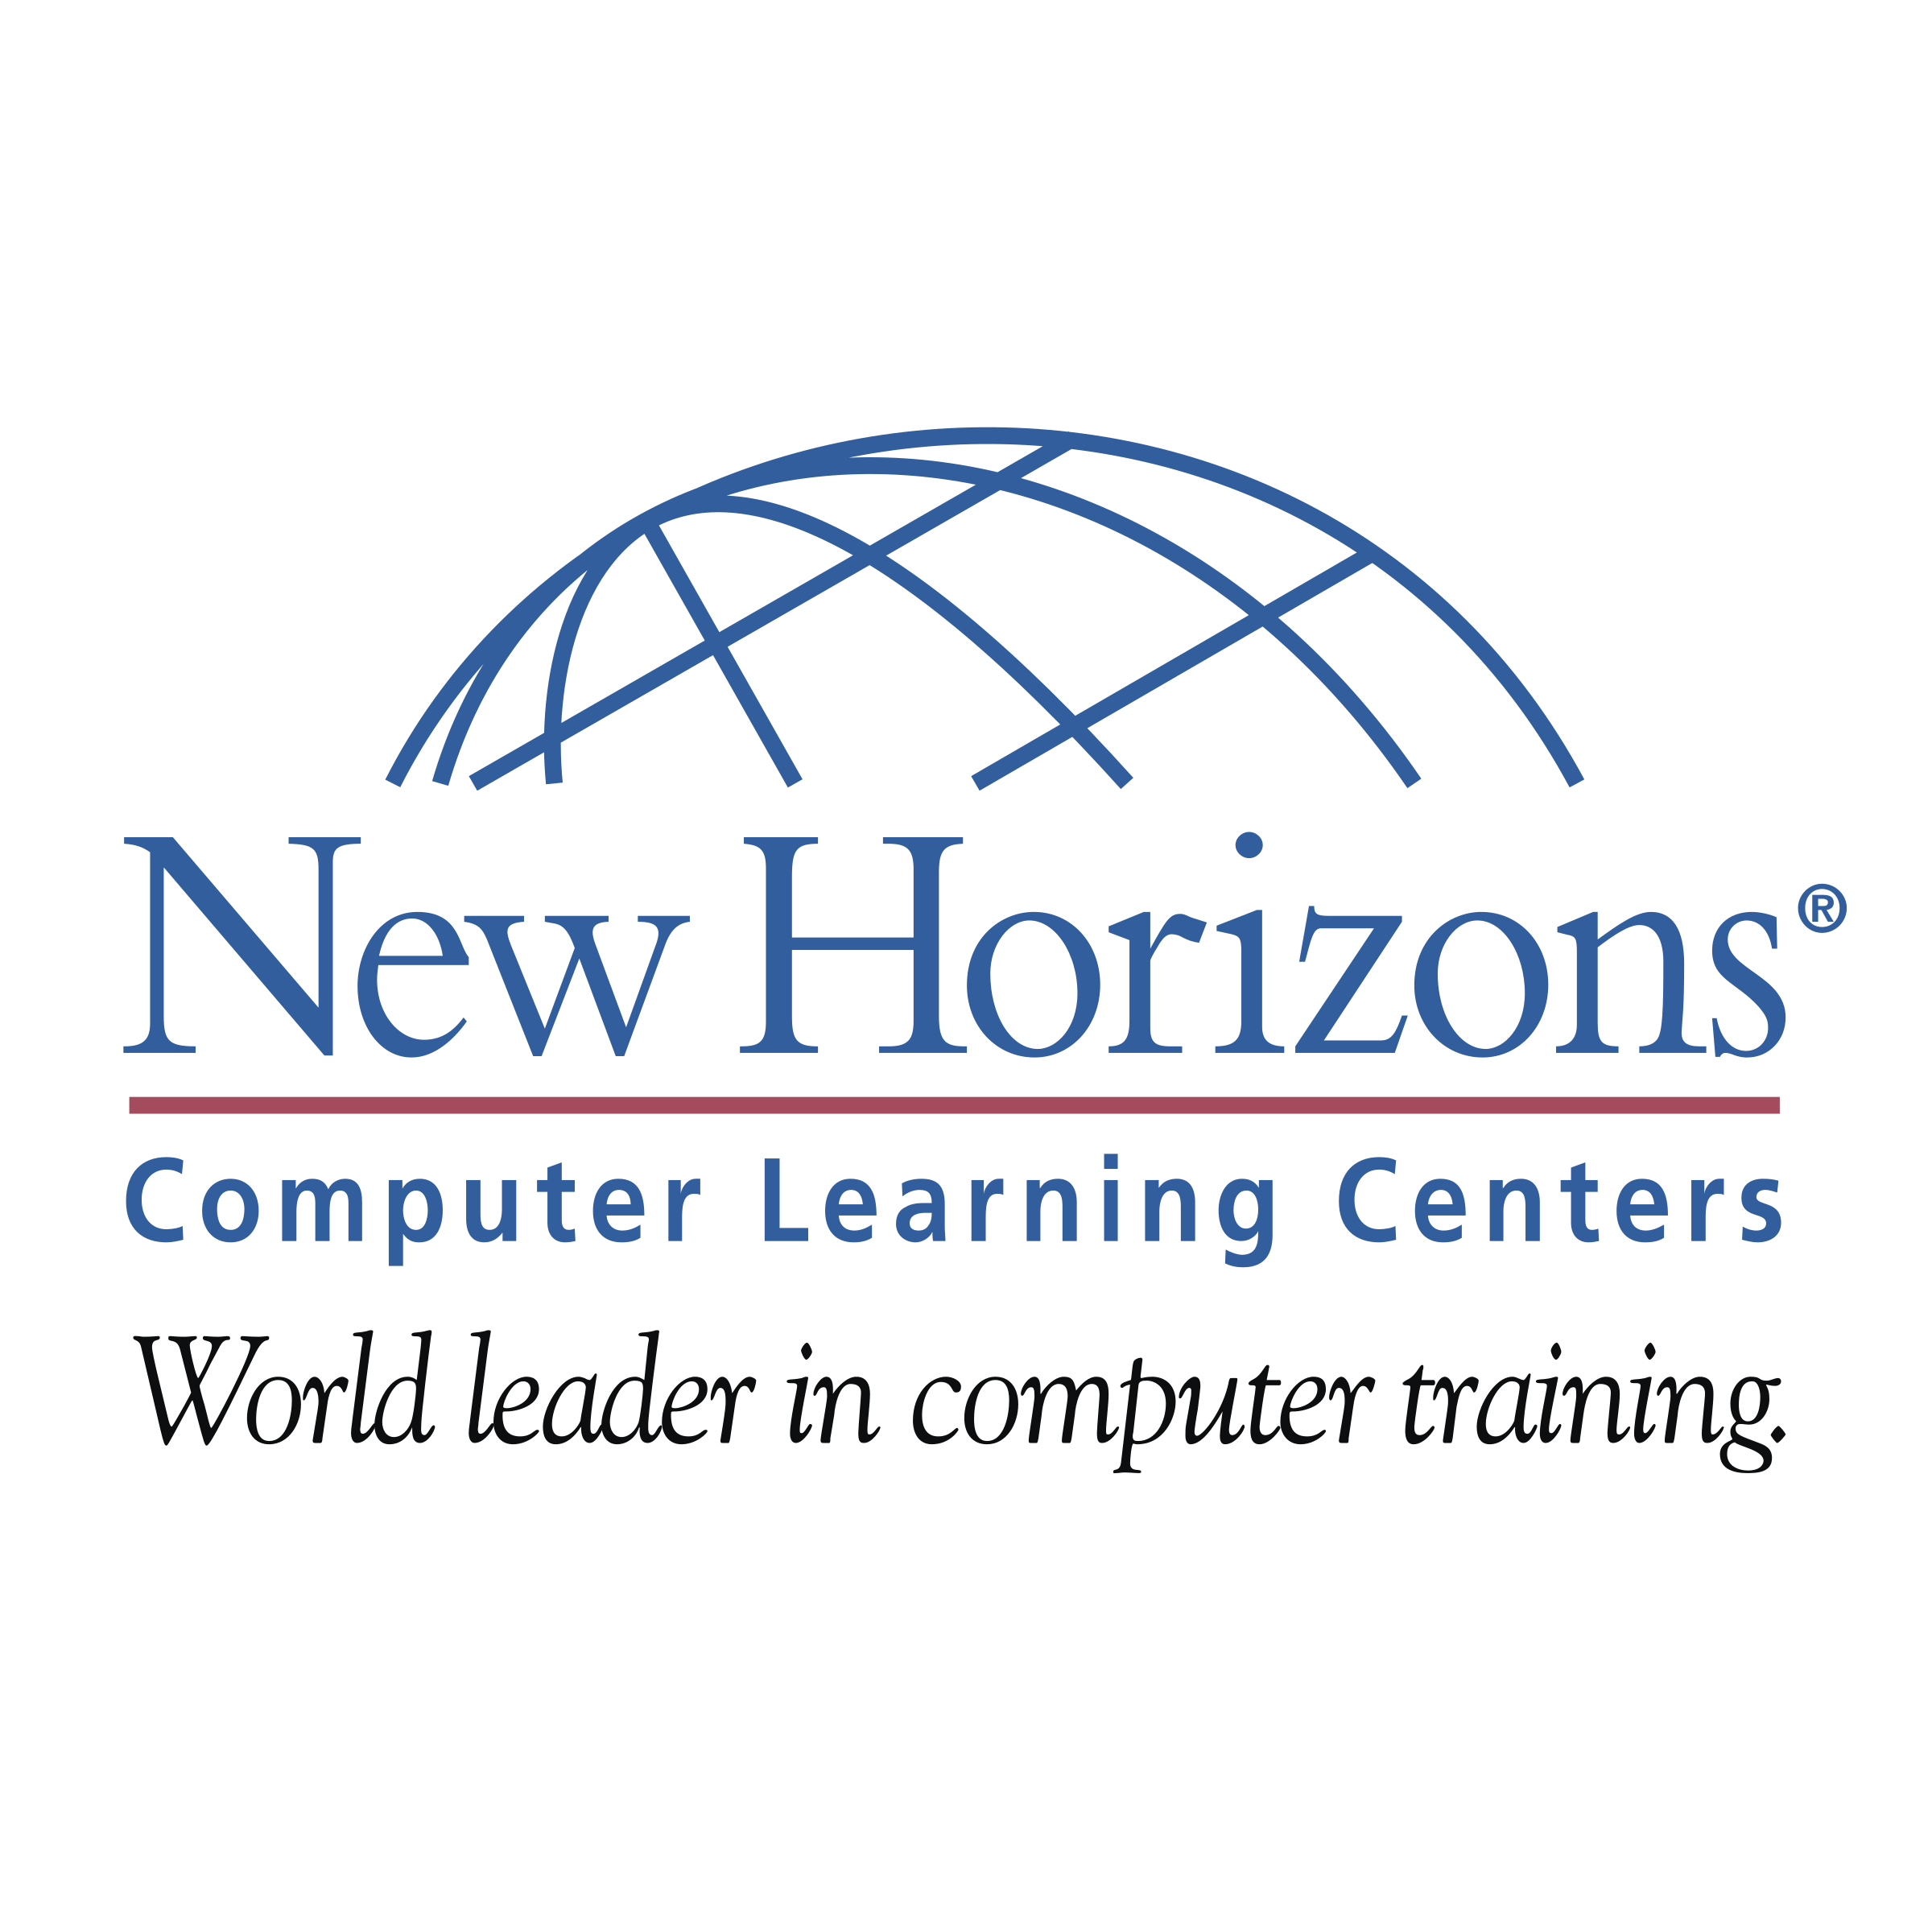 New Horizons Logo PNG Transparent & SVG Vector.